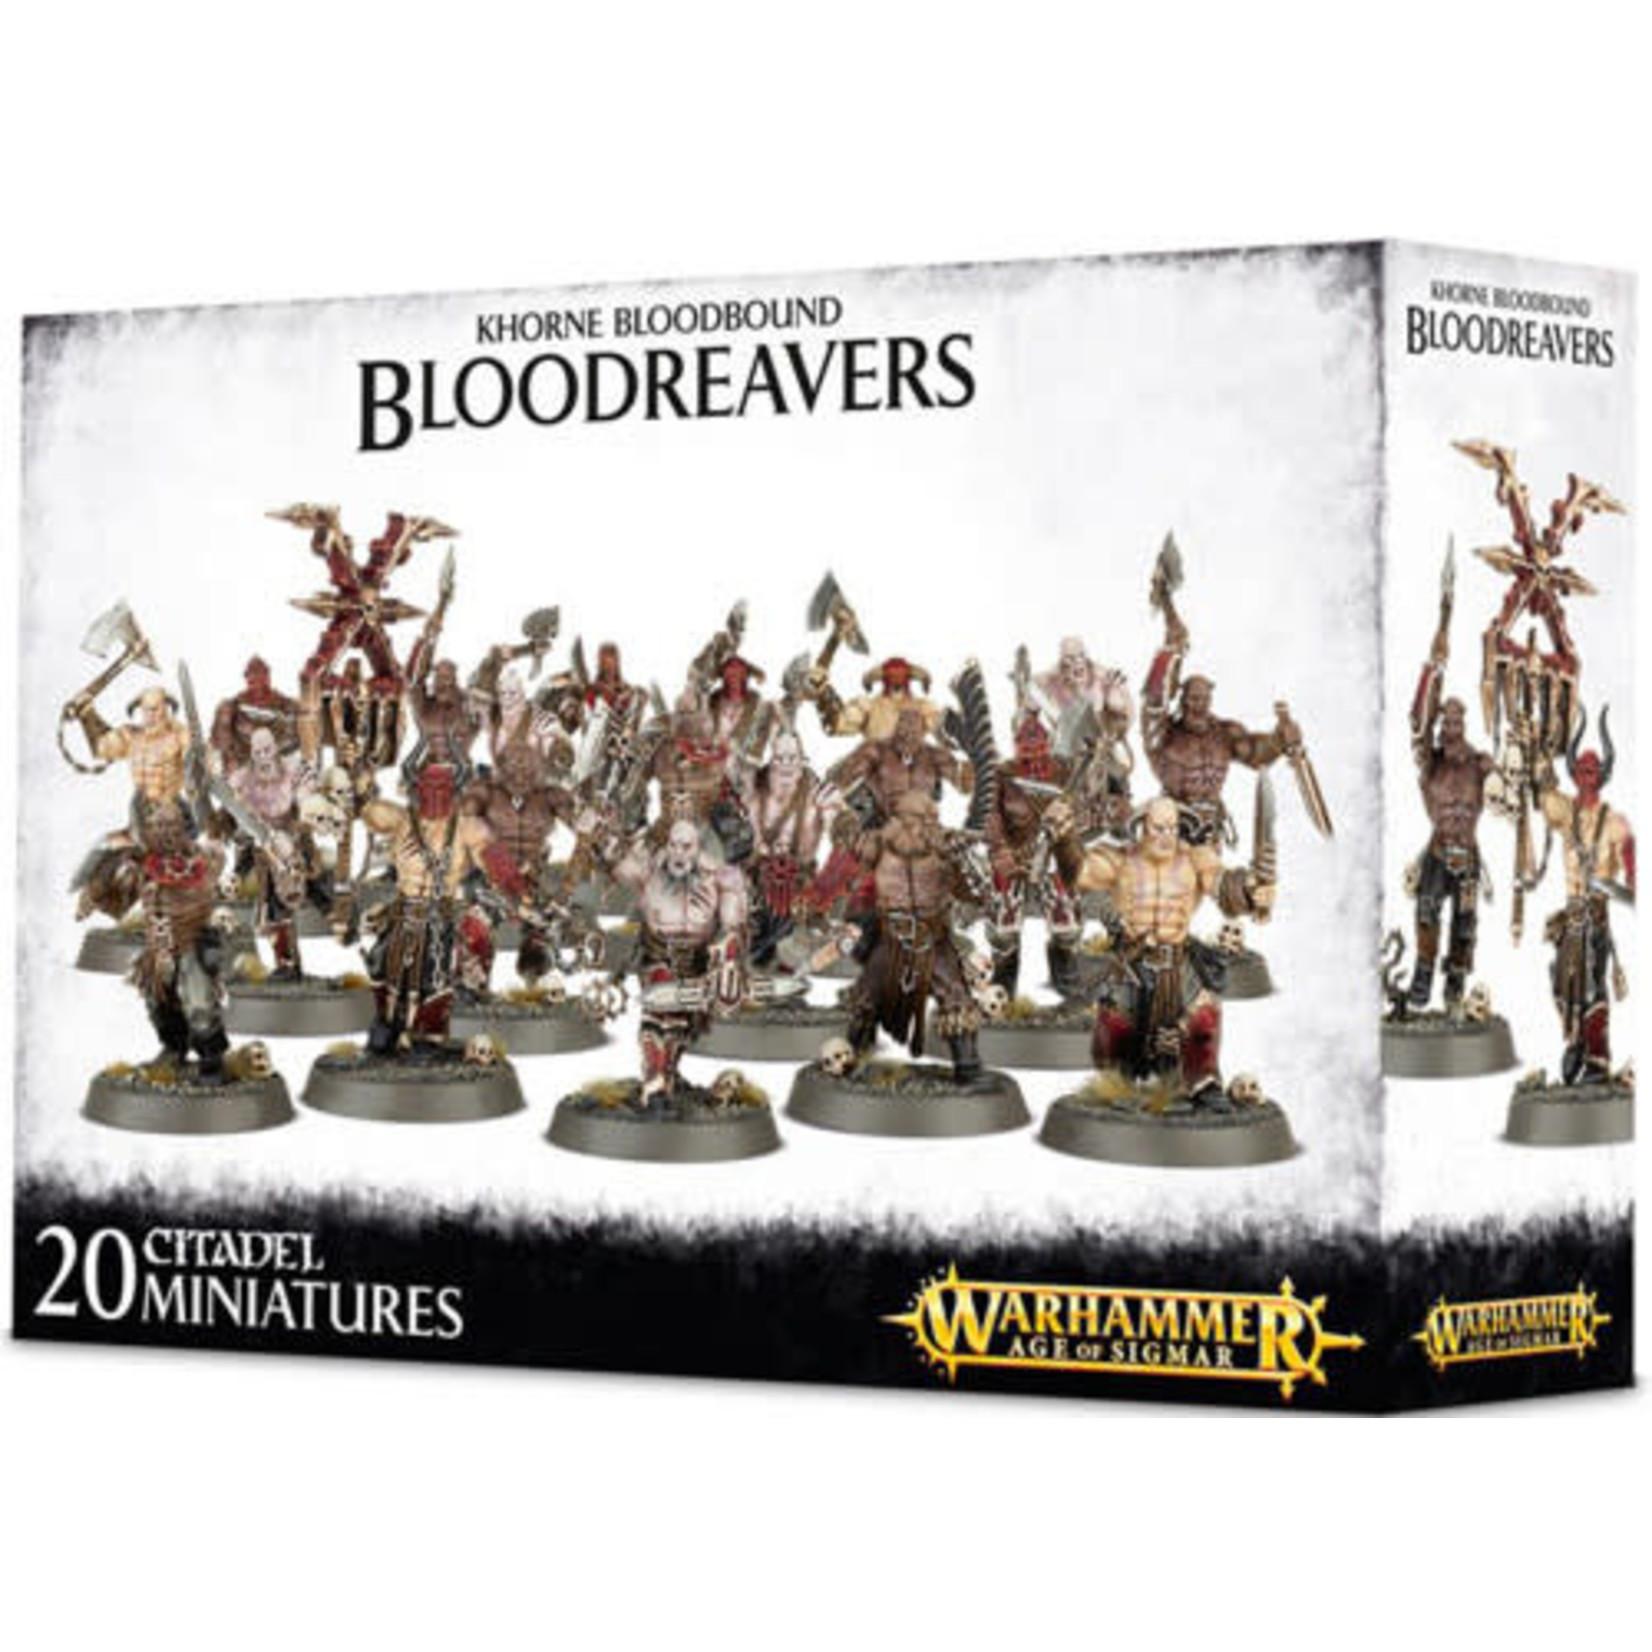 Games Workshop Warhammer Age of Sigmar: Khorne Bloodbound Bloodreavers